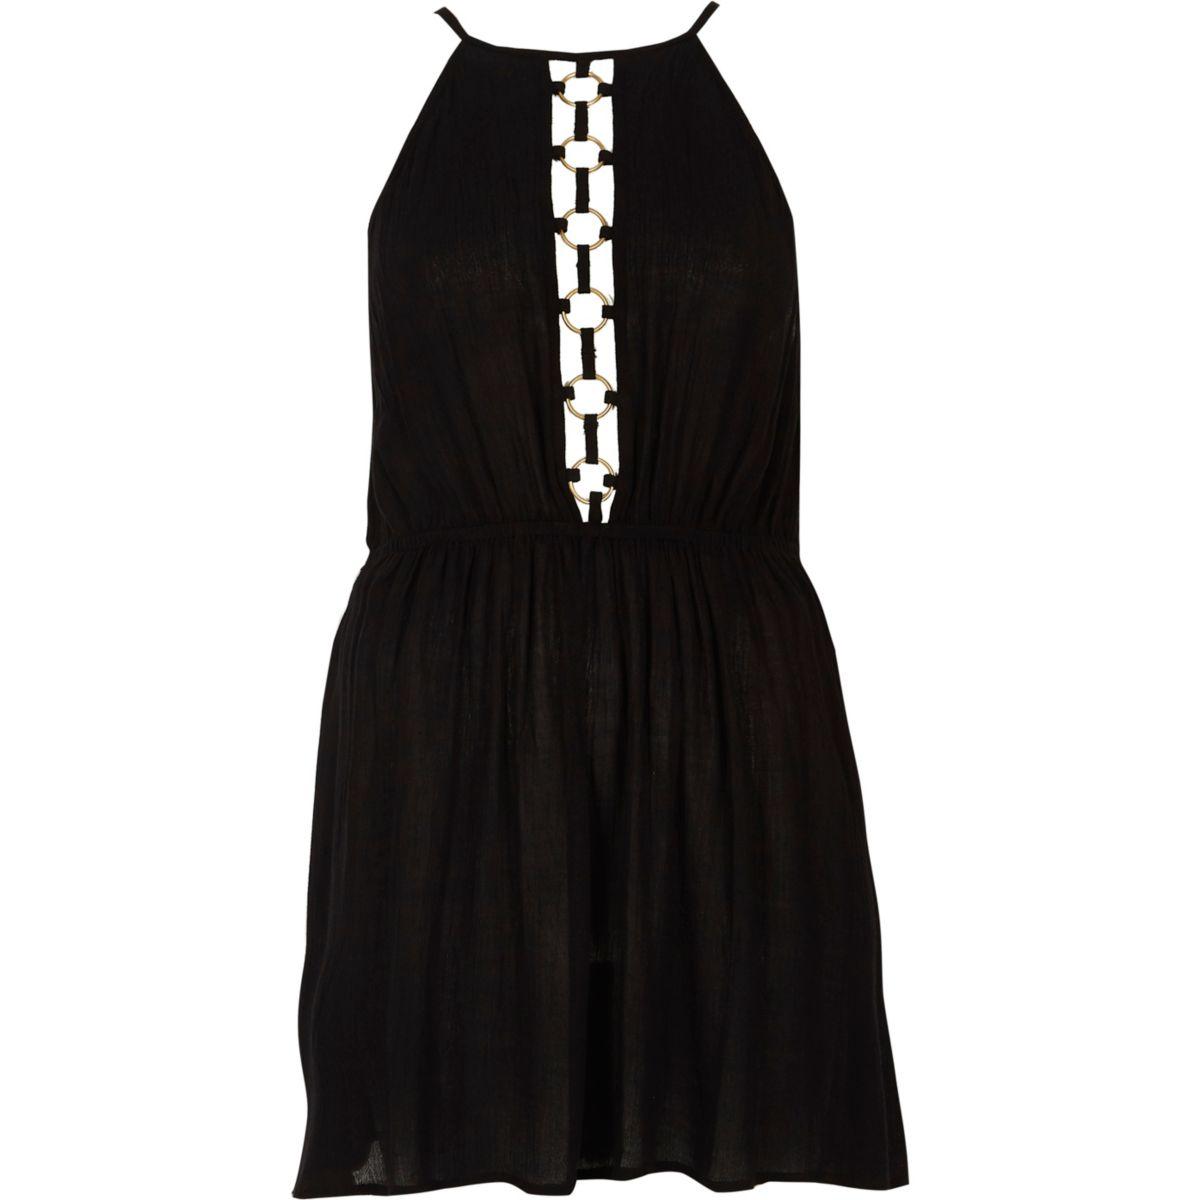 Black ring front halterneck beach dress